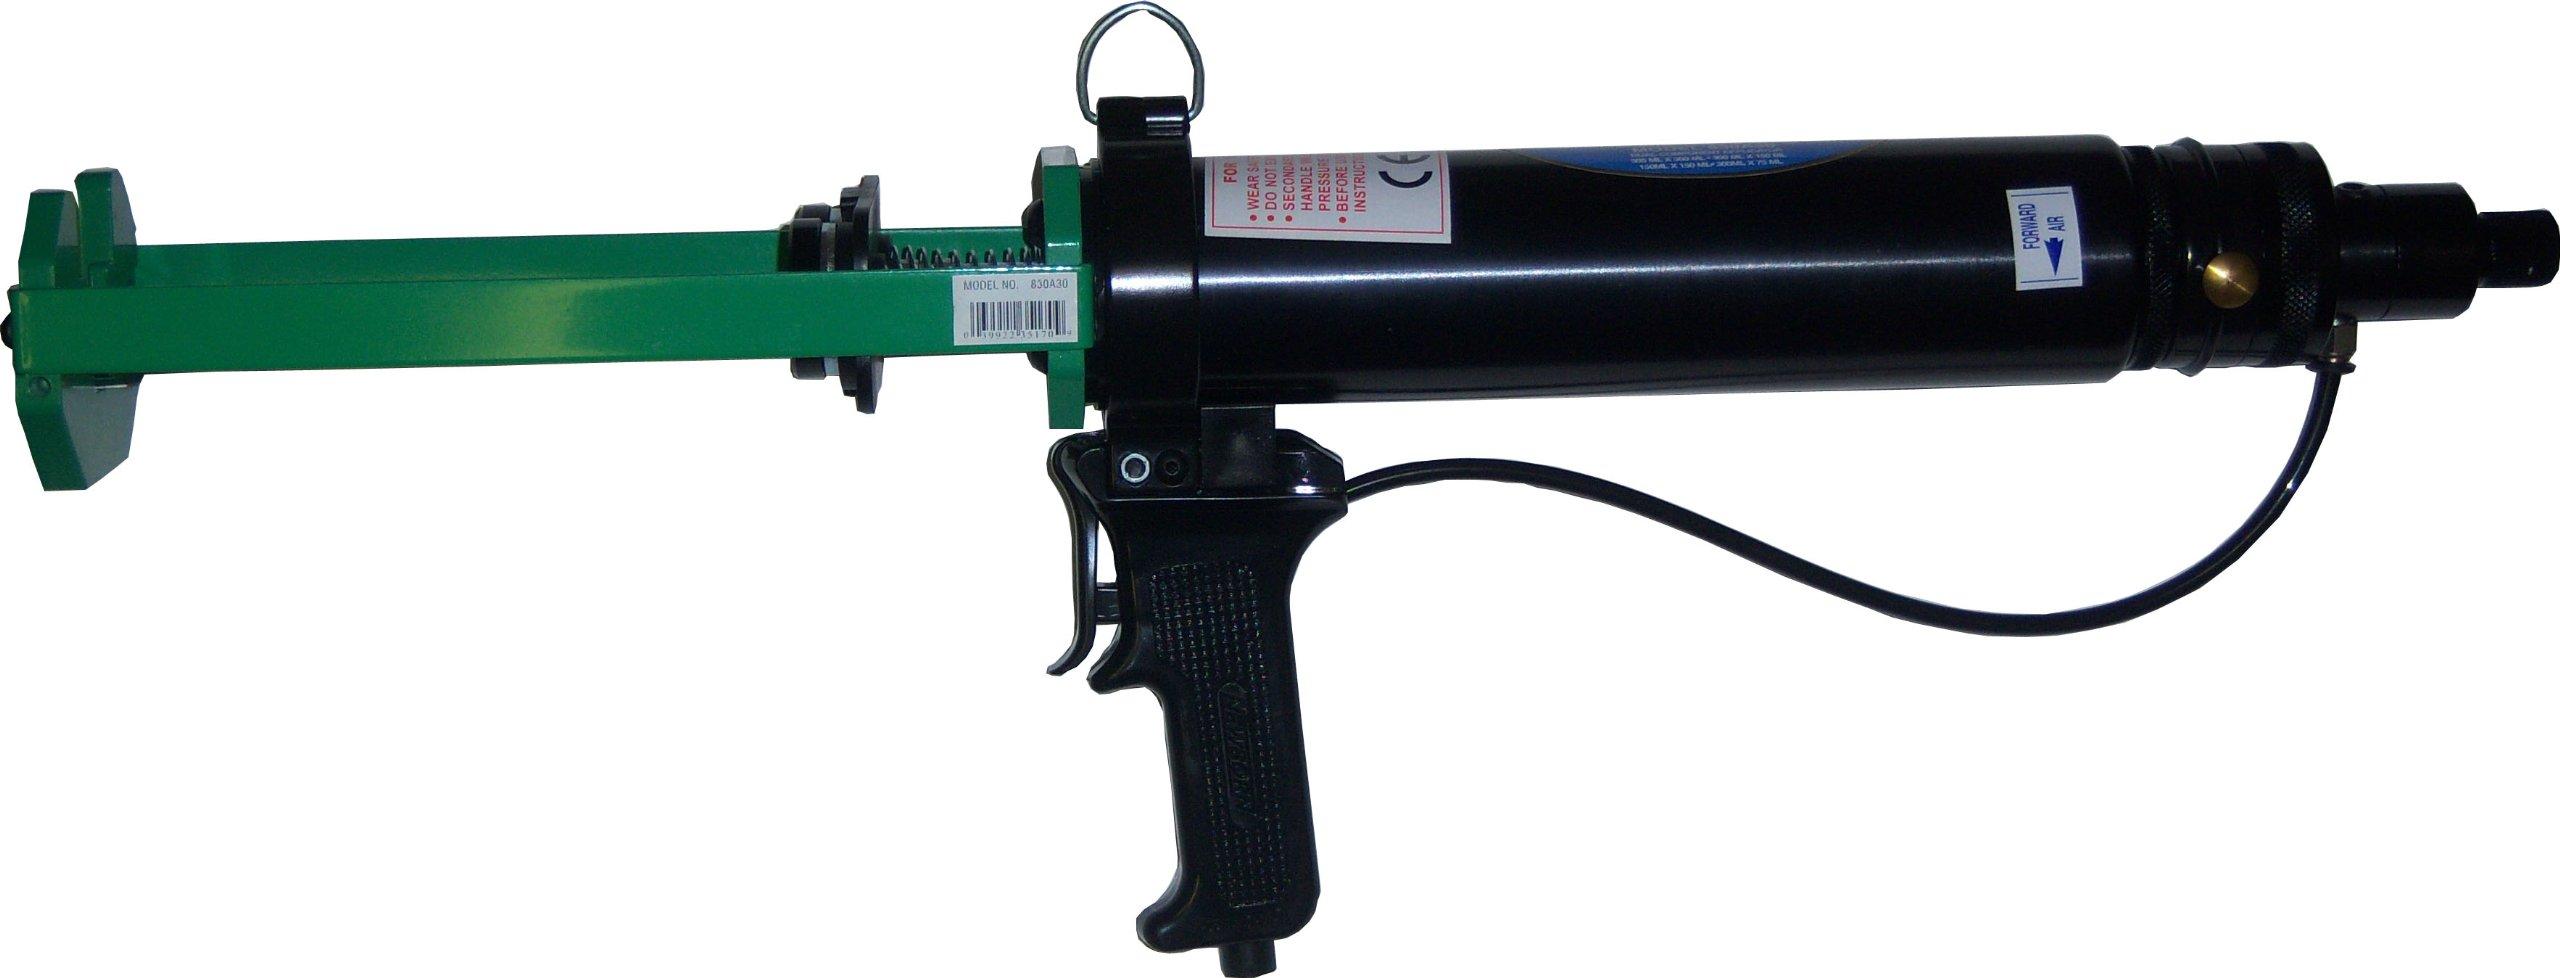 Newborn 830A30 Dual Component Pneumatic Applicator, 2-1/2'' Cylinder, for 300 mL x 300 mL Cartridges, 100 psi